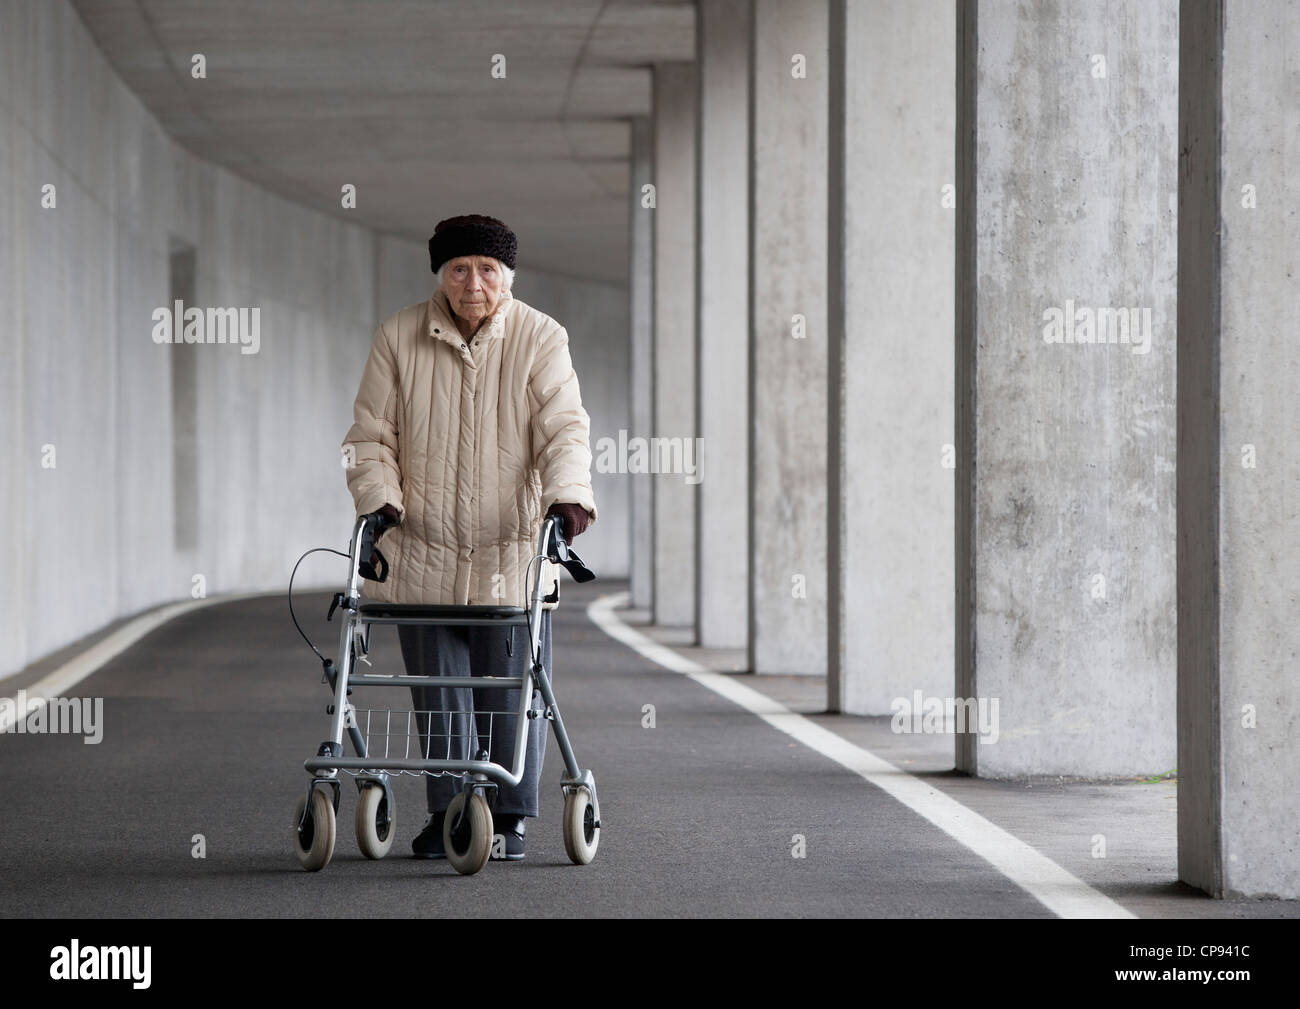 Austria, Senior woman with wheeled walker at Subway - Stock Image